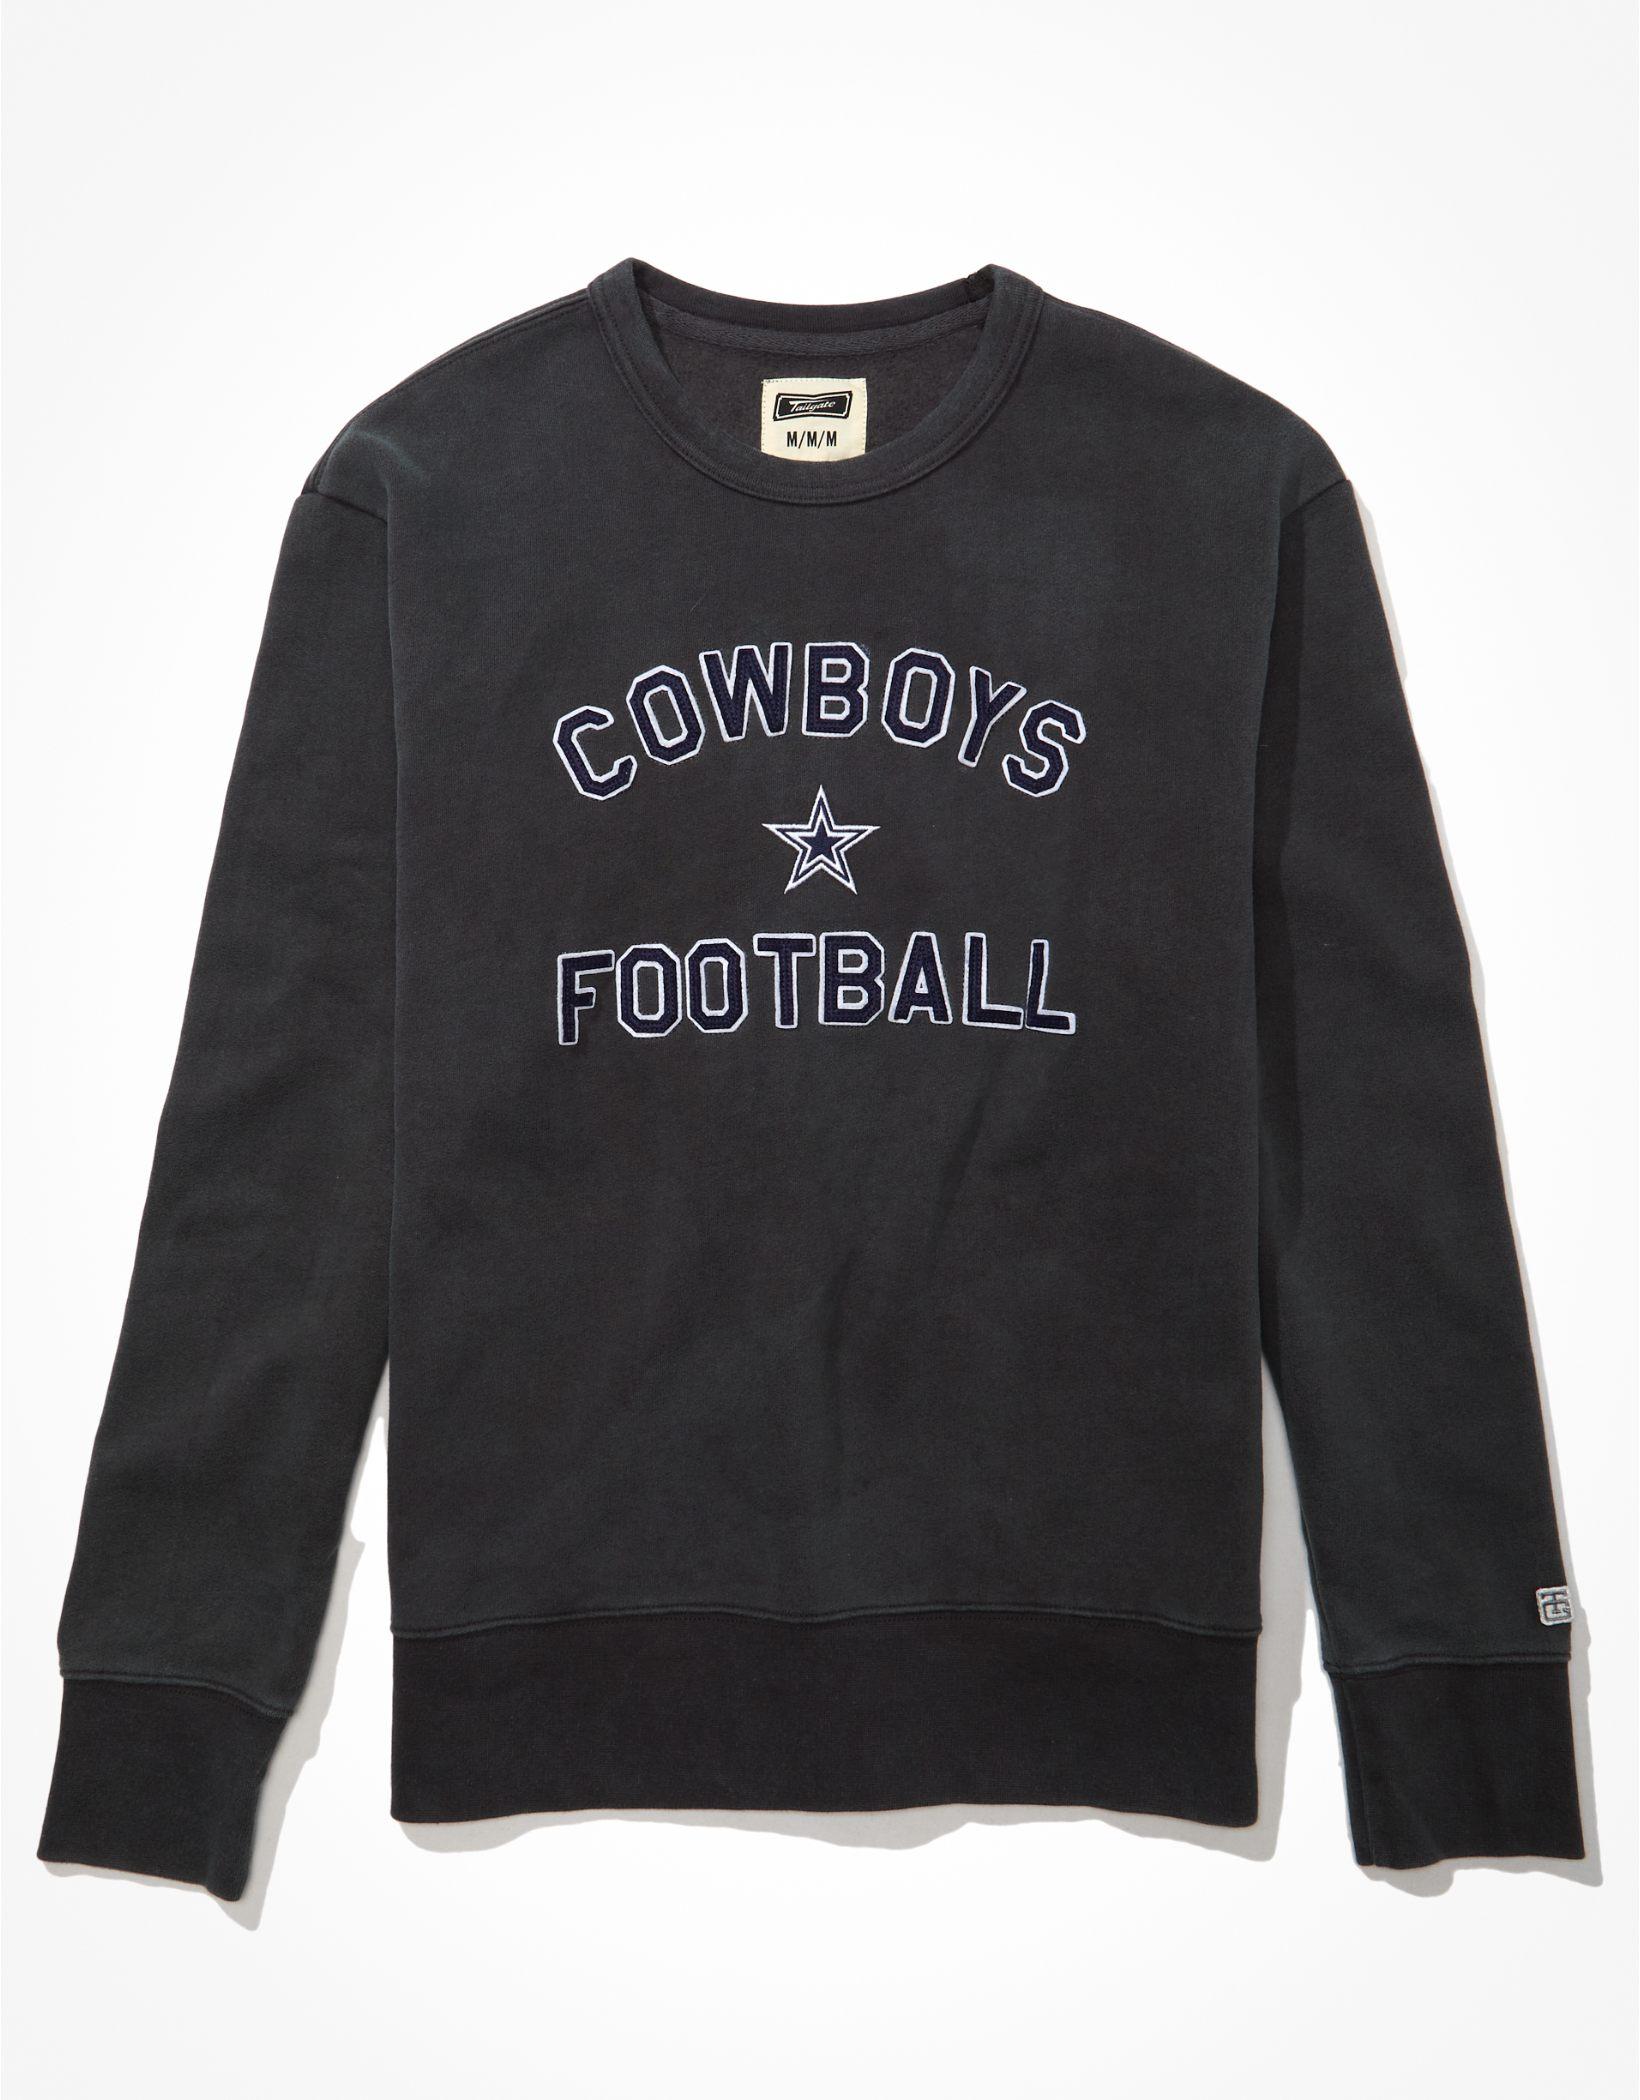 Tailgate Men's Dallas Cowboys Graphic Fleece Sweatshirt